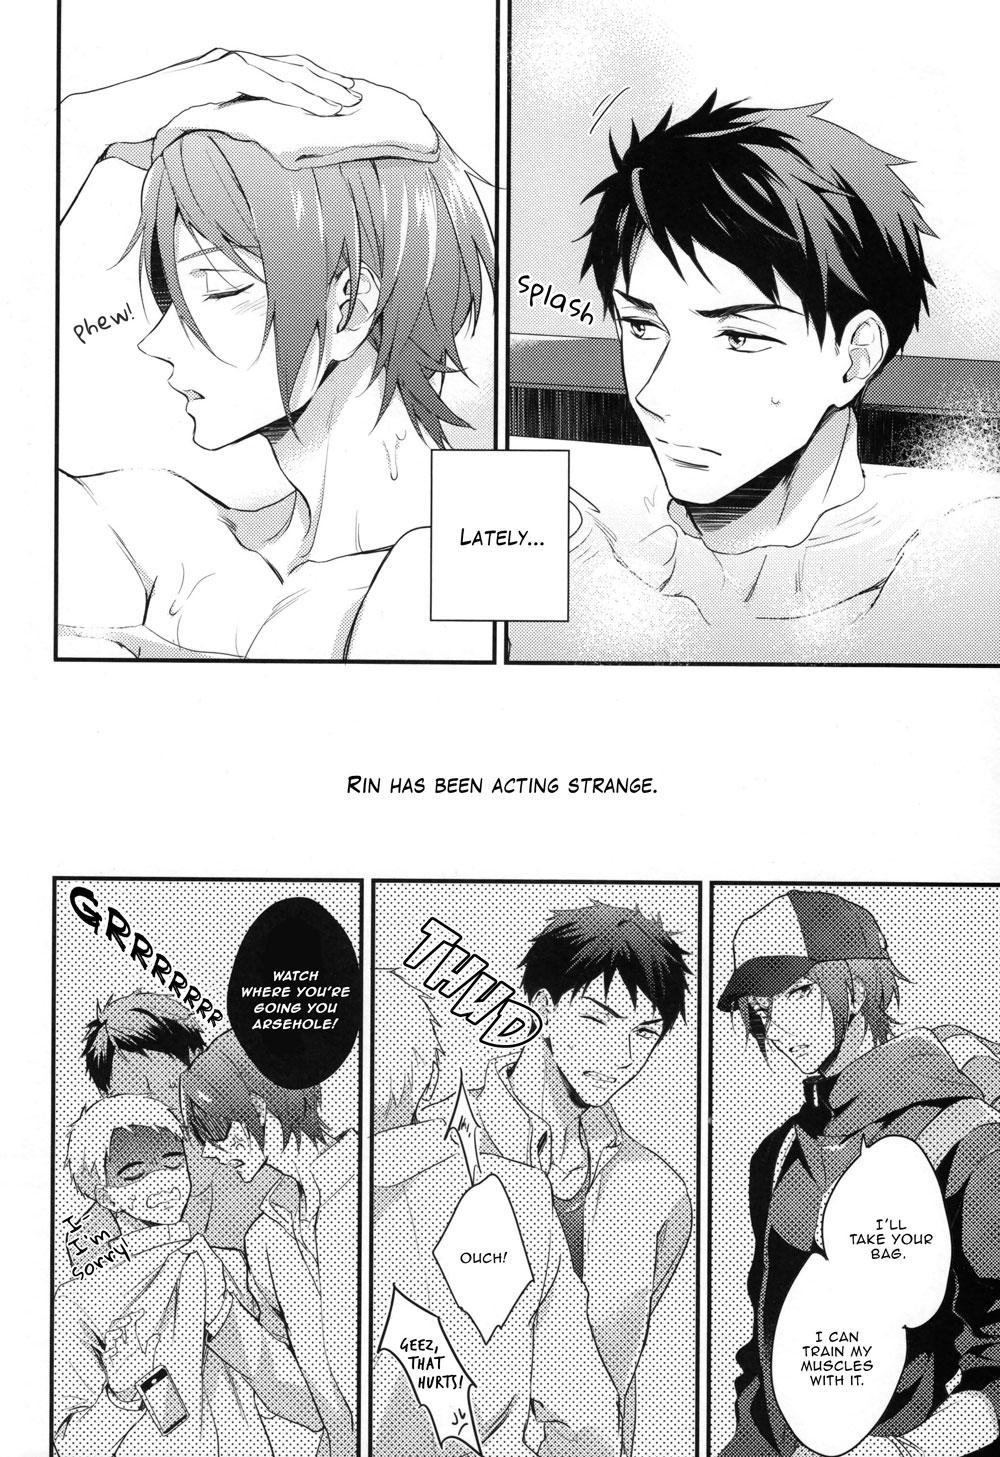 Sousuke no Kata wa Ore ga Mamoru! | I'll protect Sosuke's shoulder! 2